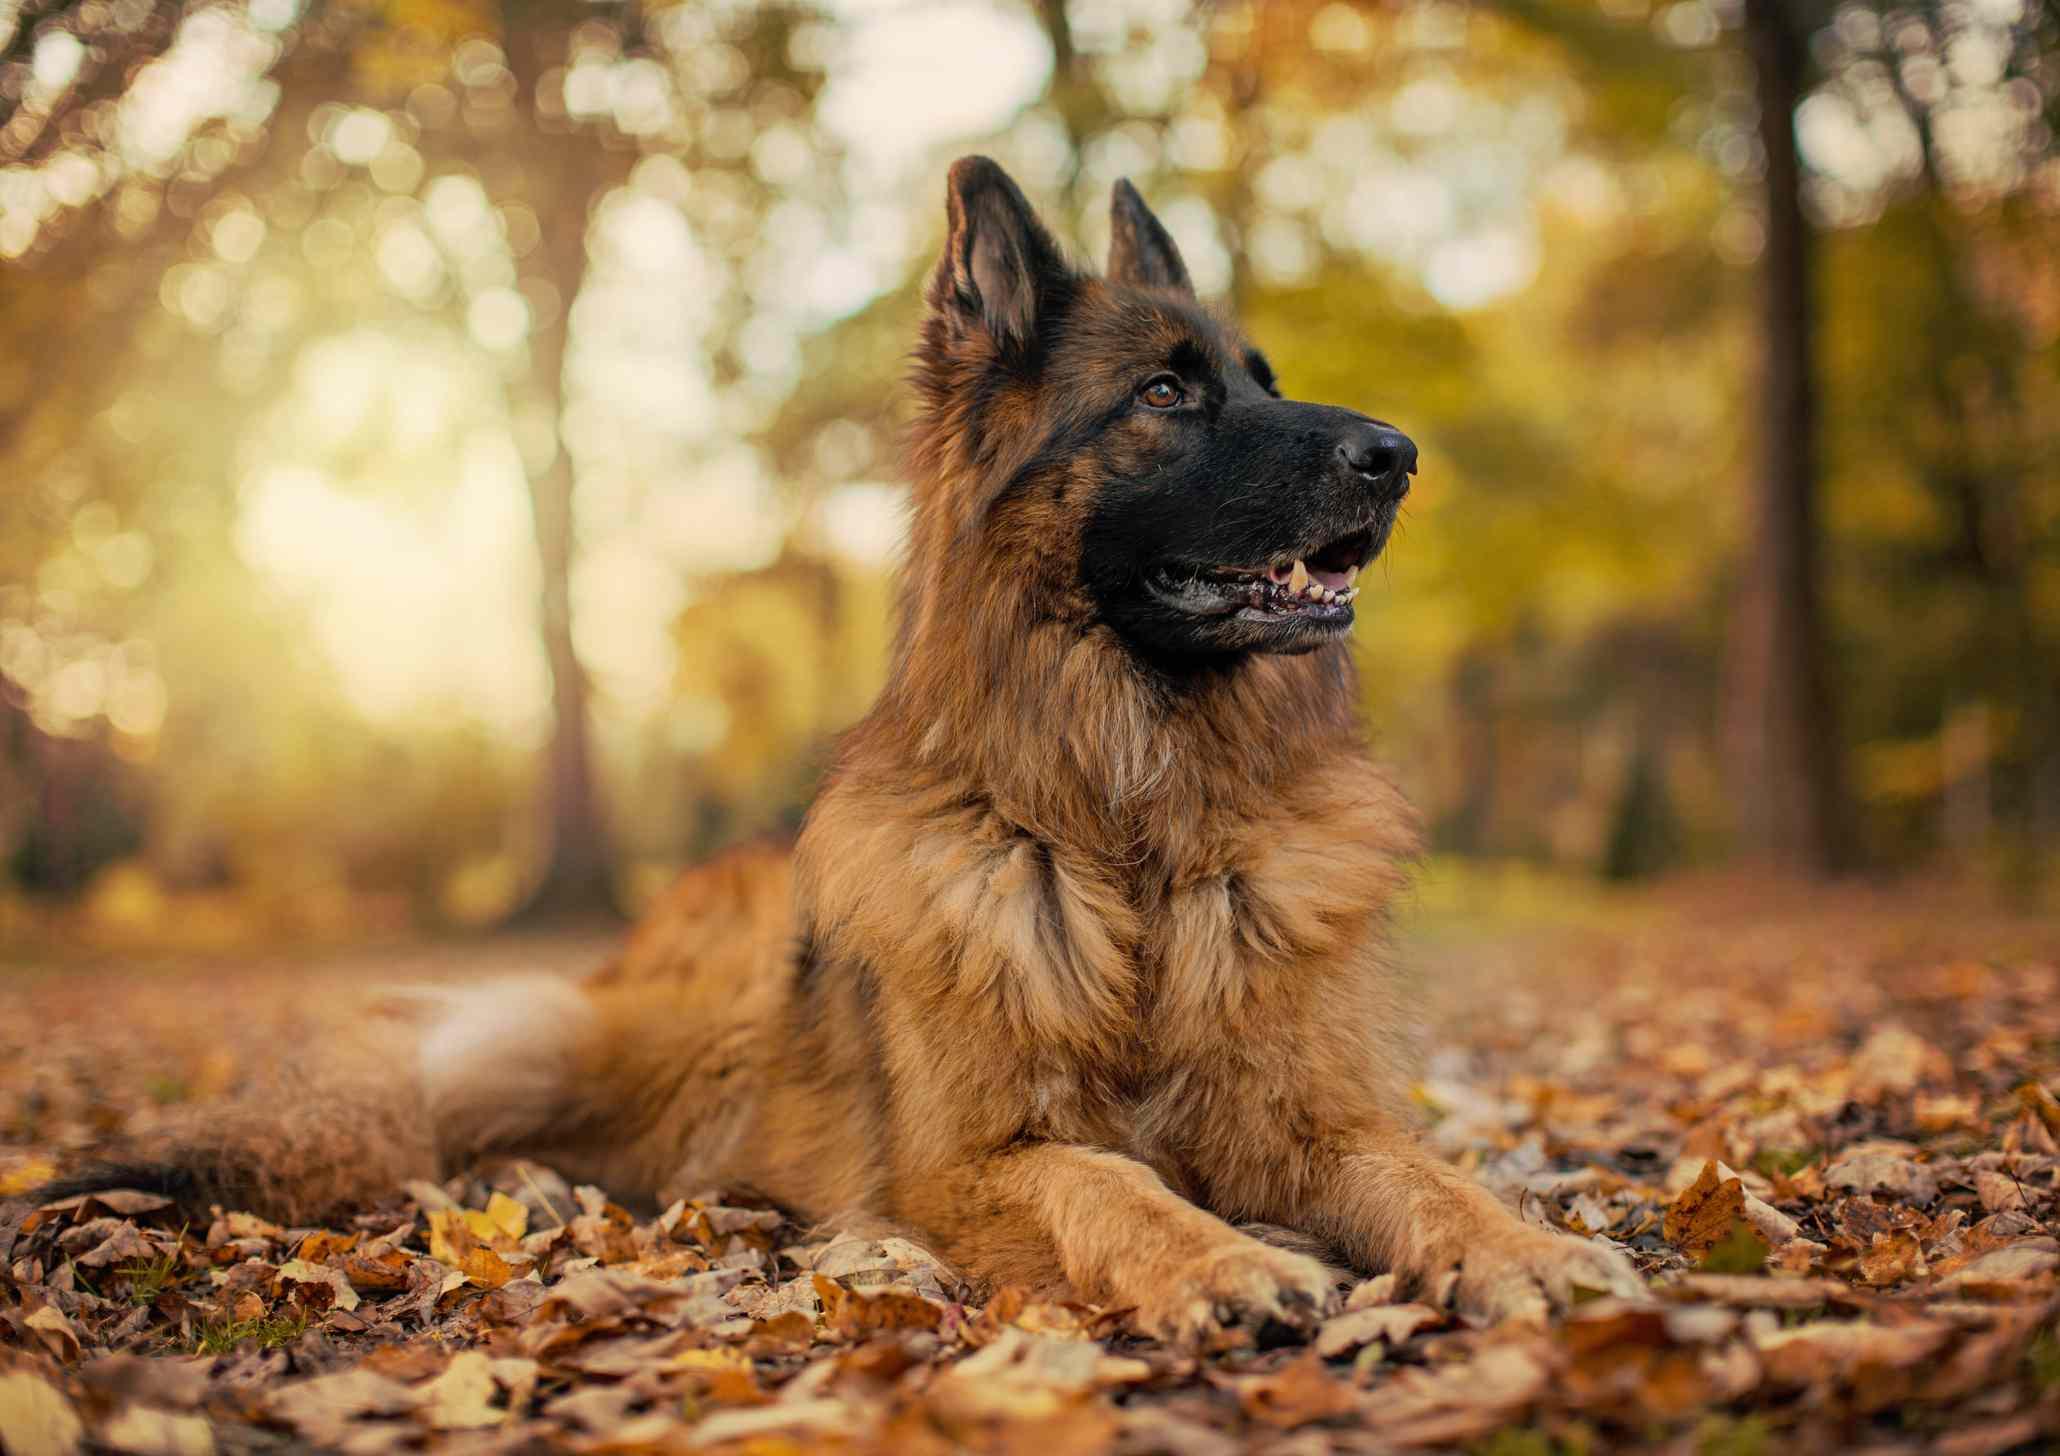 A German shepherd dog lying in the fall leaves